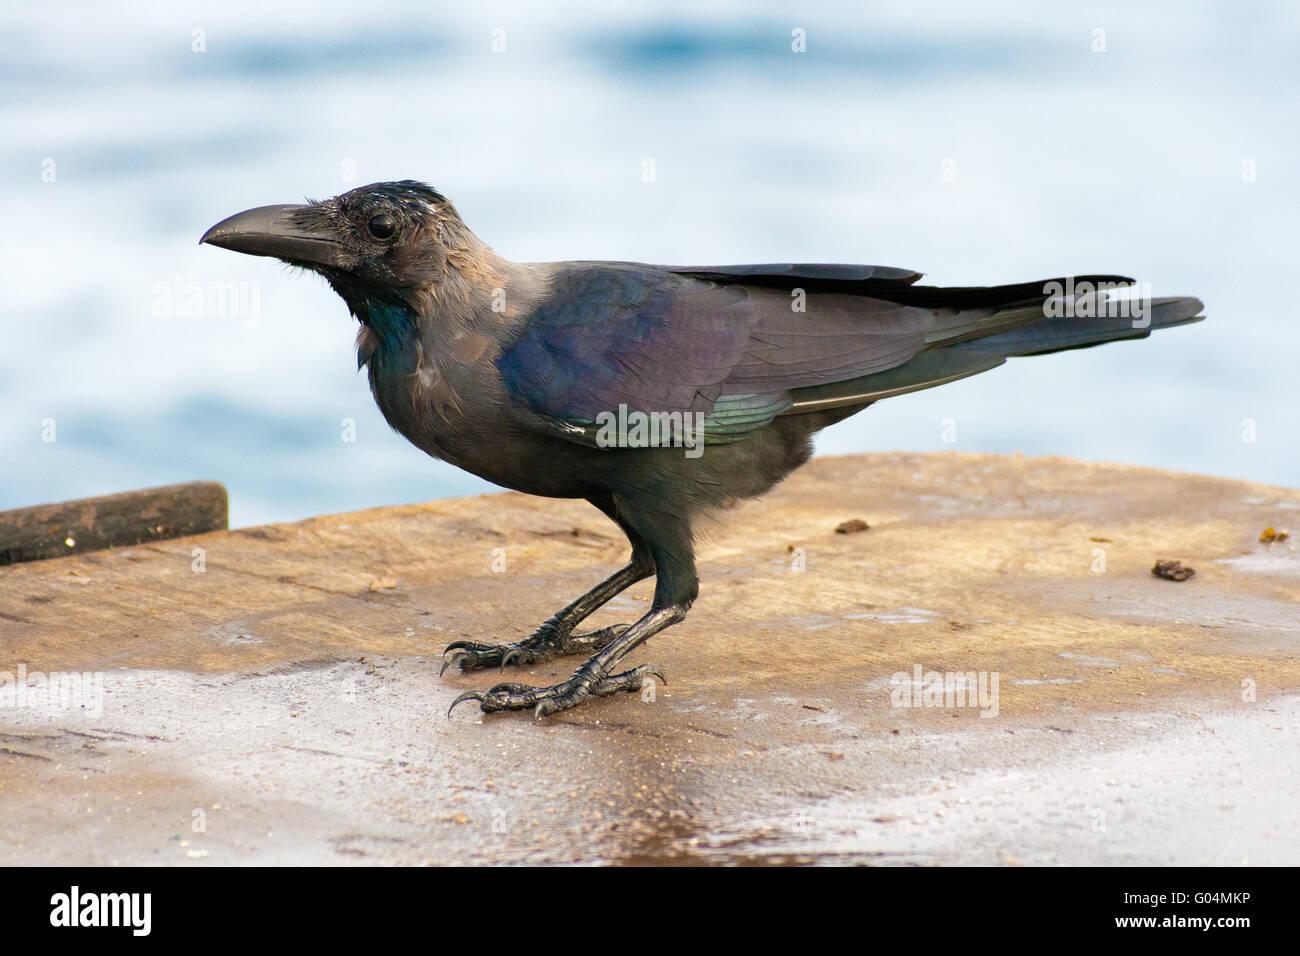 Raven - Stock Image